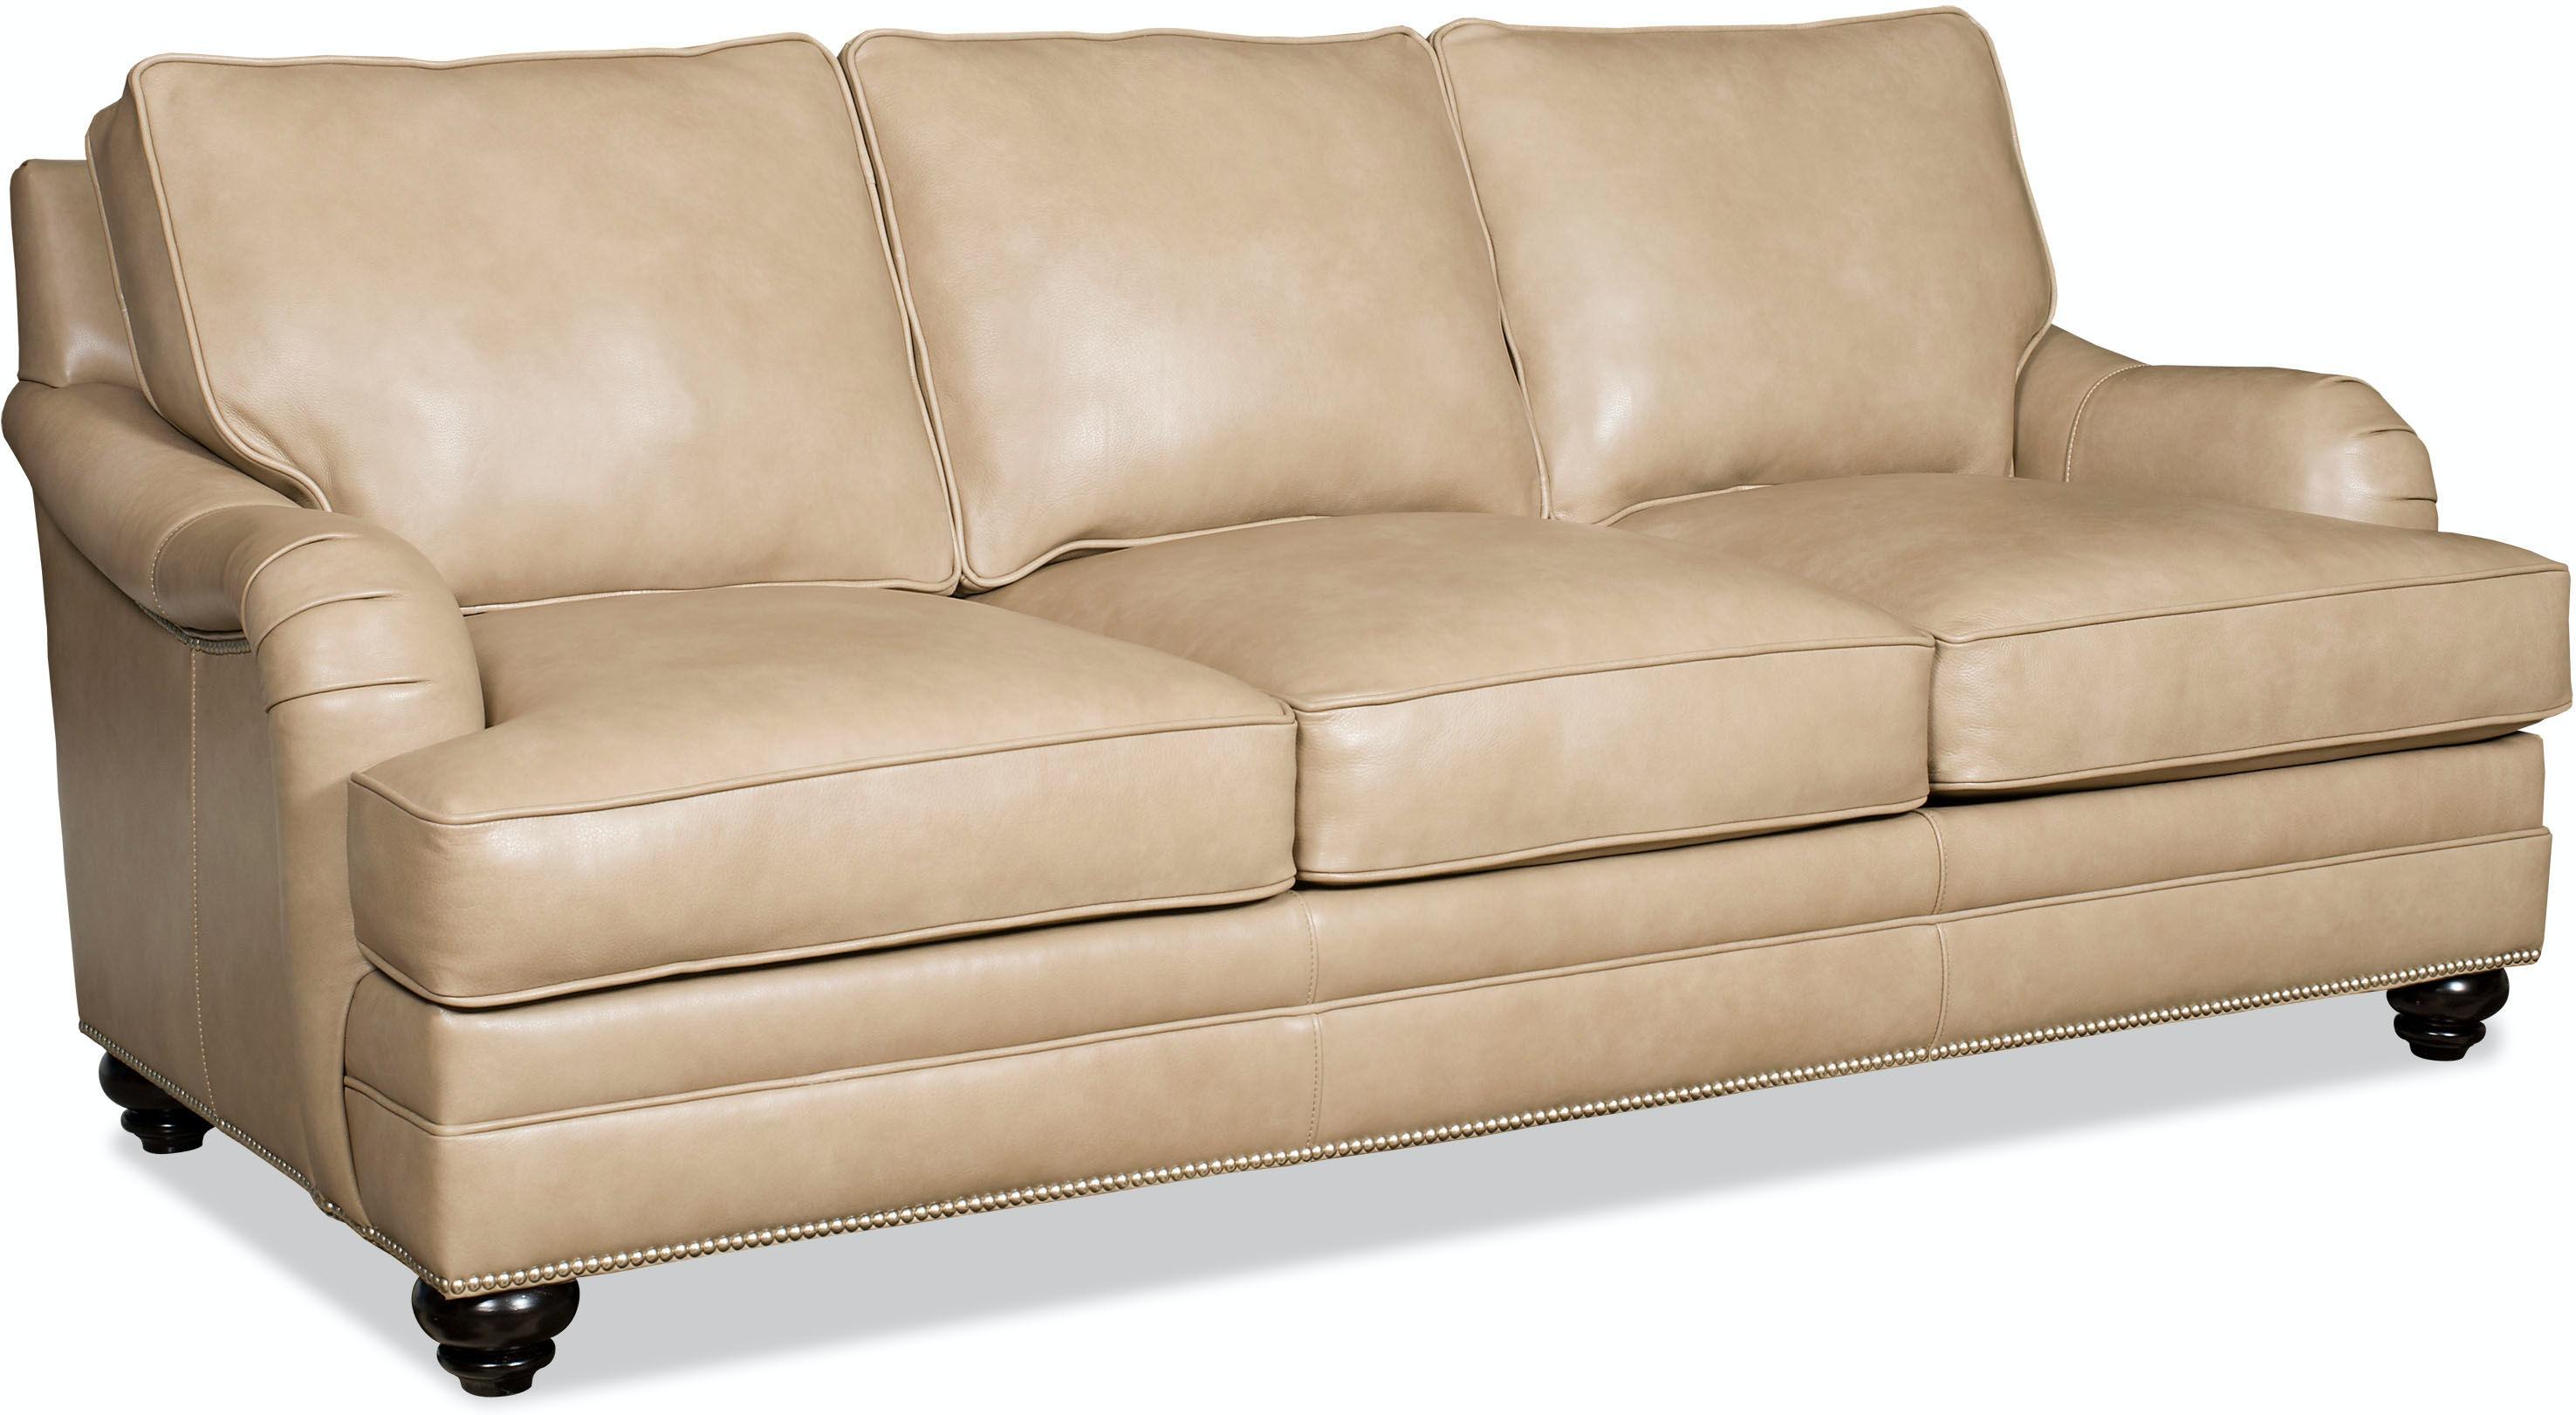 Bradington Young Furniture